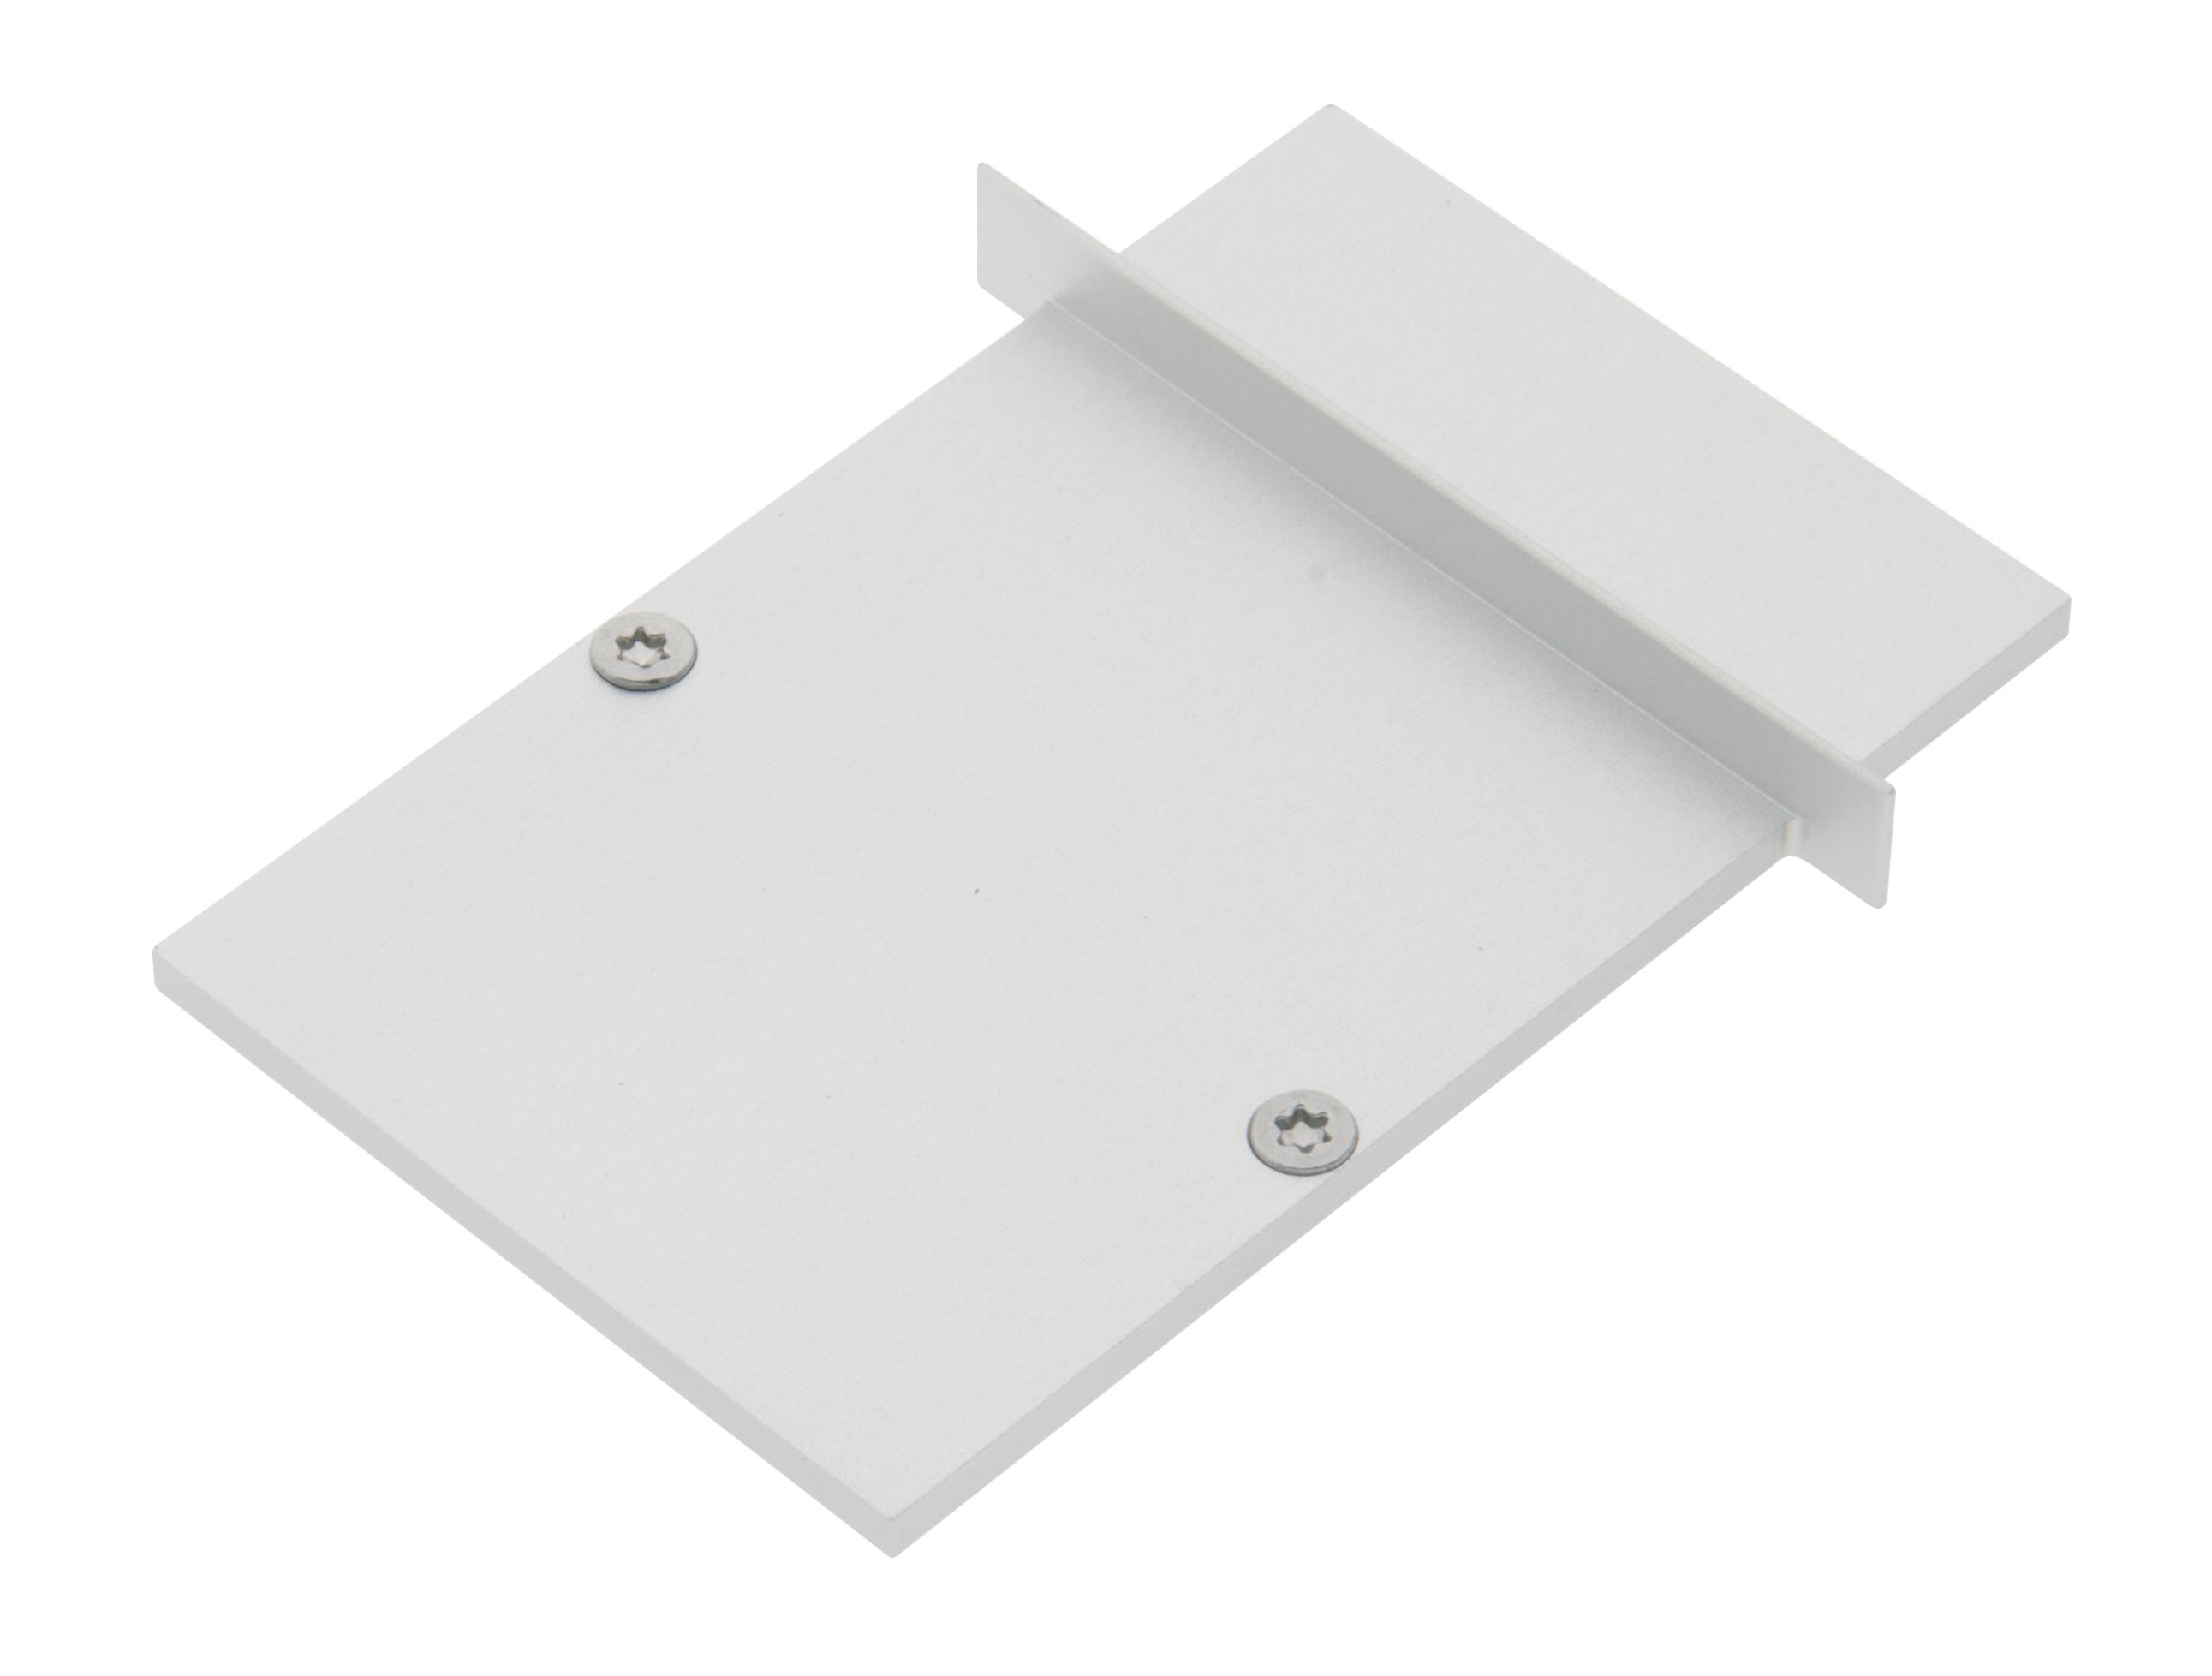 1 Stk Profil Endkappe MFI Eckig geschlossen inkl. Schrauben LIEK005320